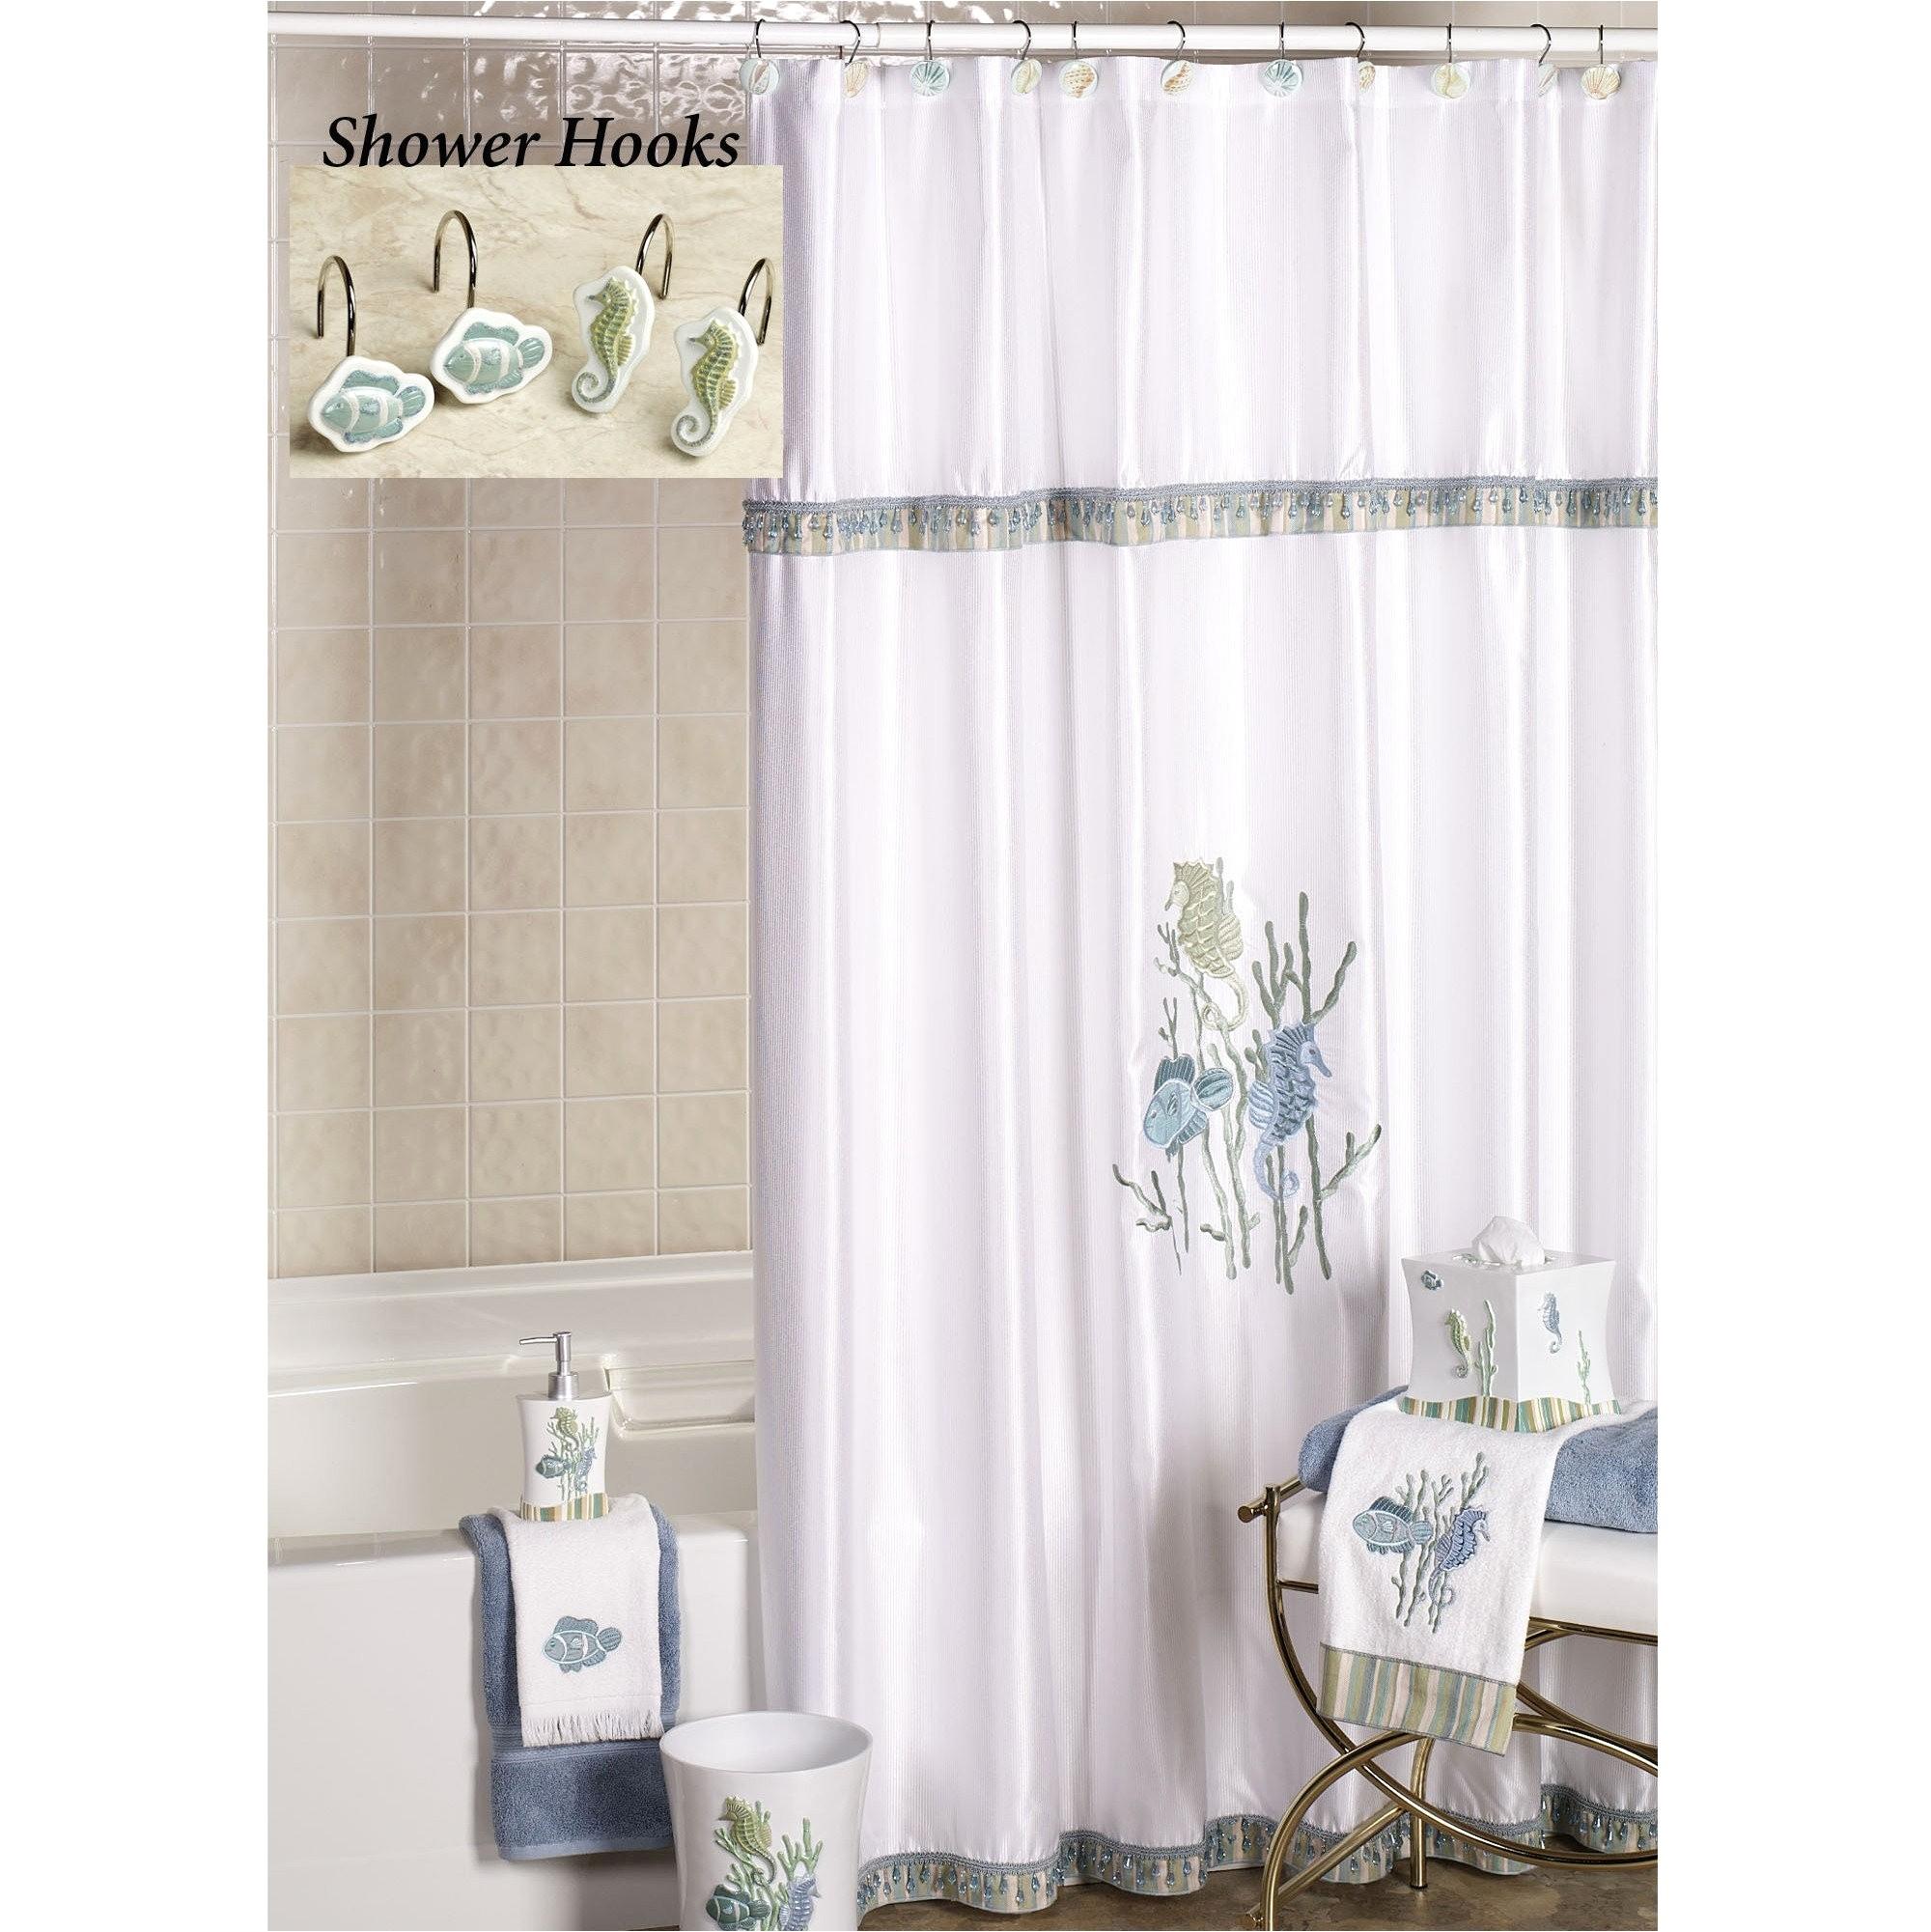 Bathroom Window Curtain Sets Inspirational Unique Shower And Curtains Portrait